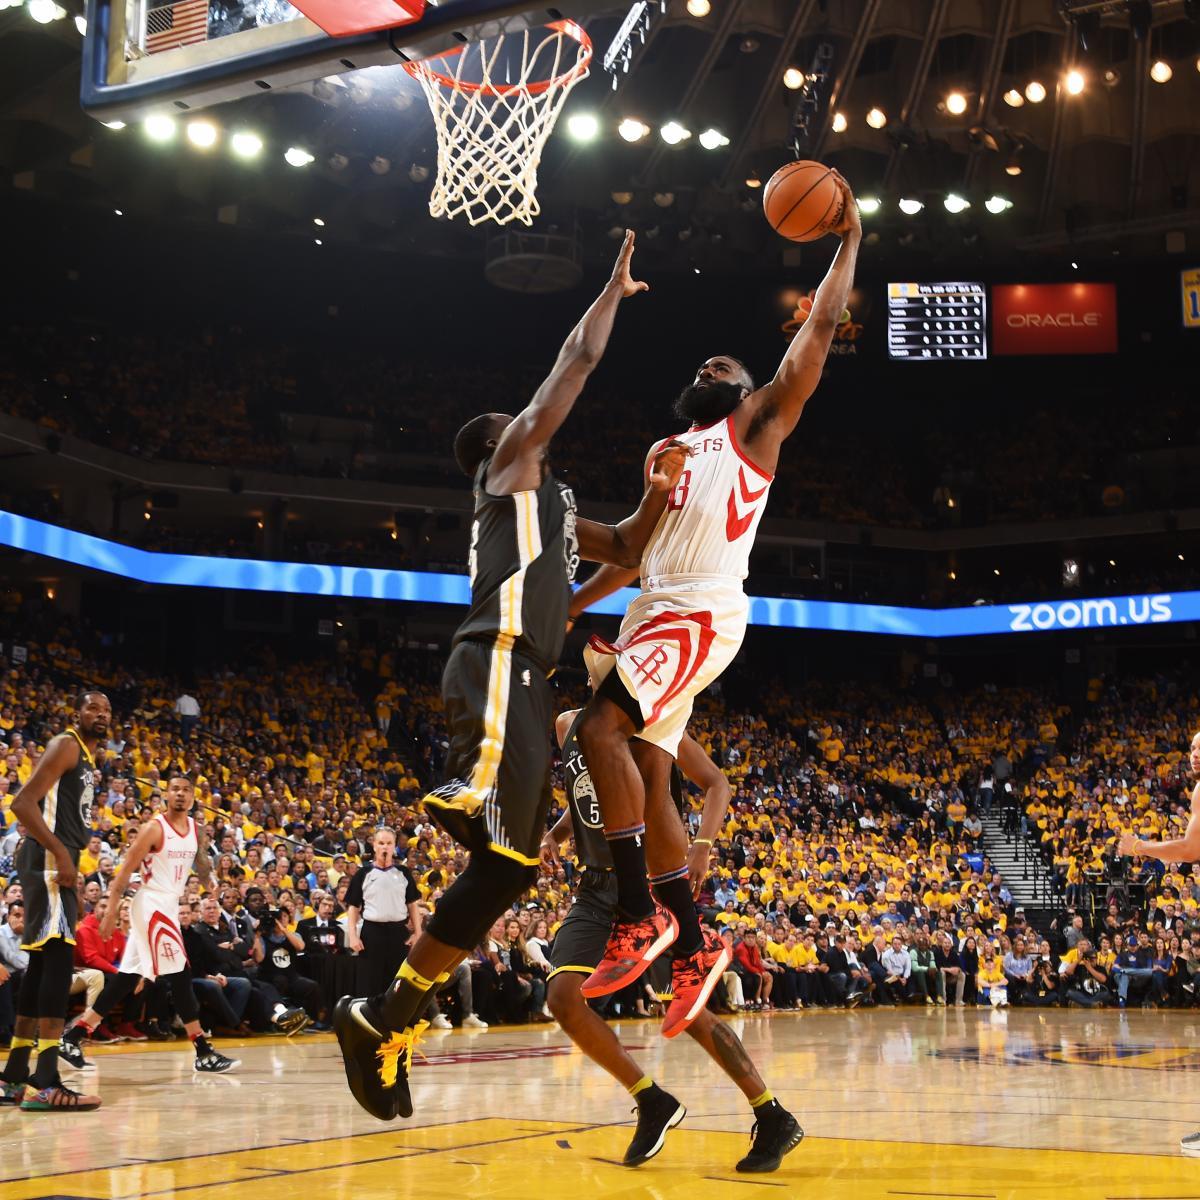 Rockets Vs Warriors James Harden: James Harden Throws Down Incredible Dunk In Game 4 Vs